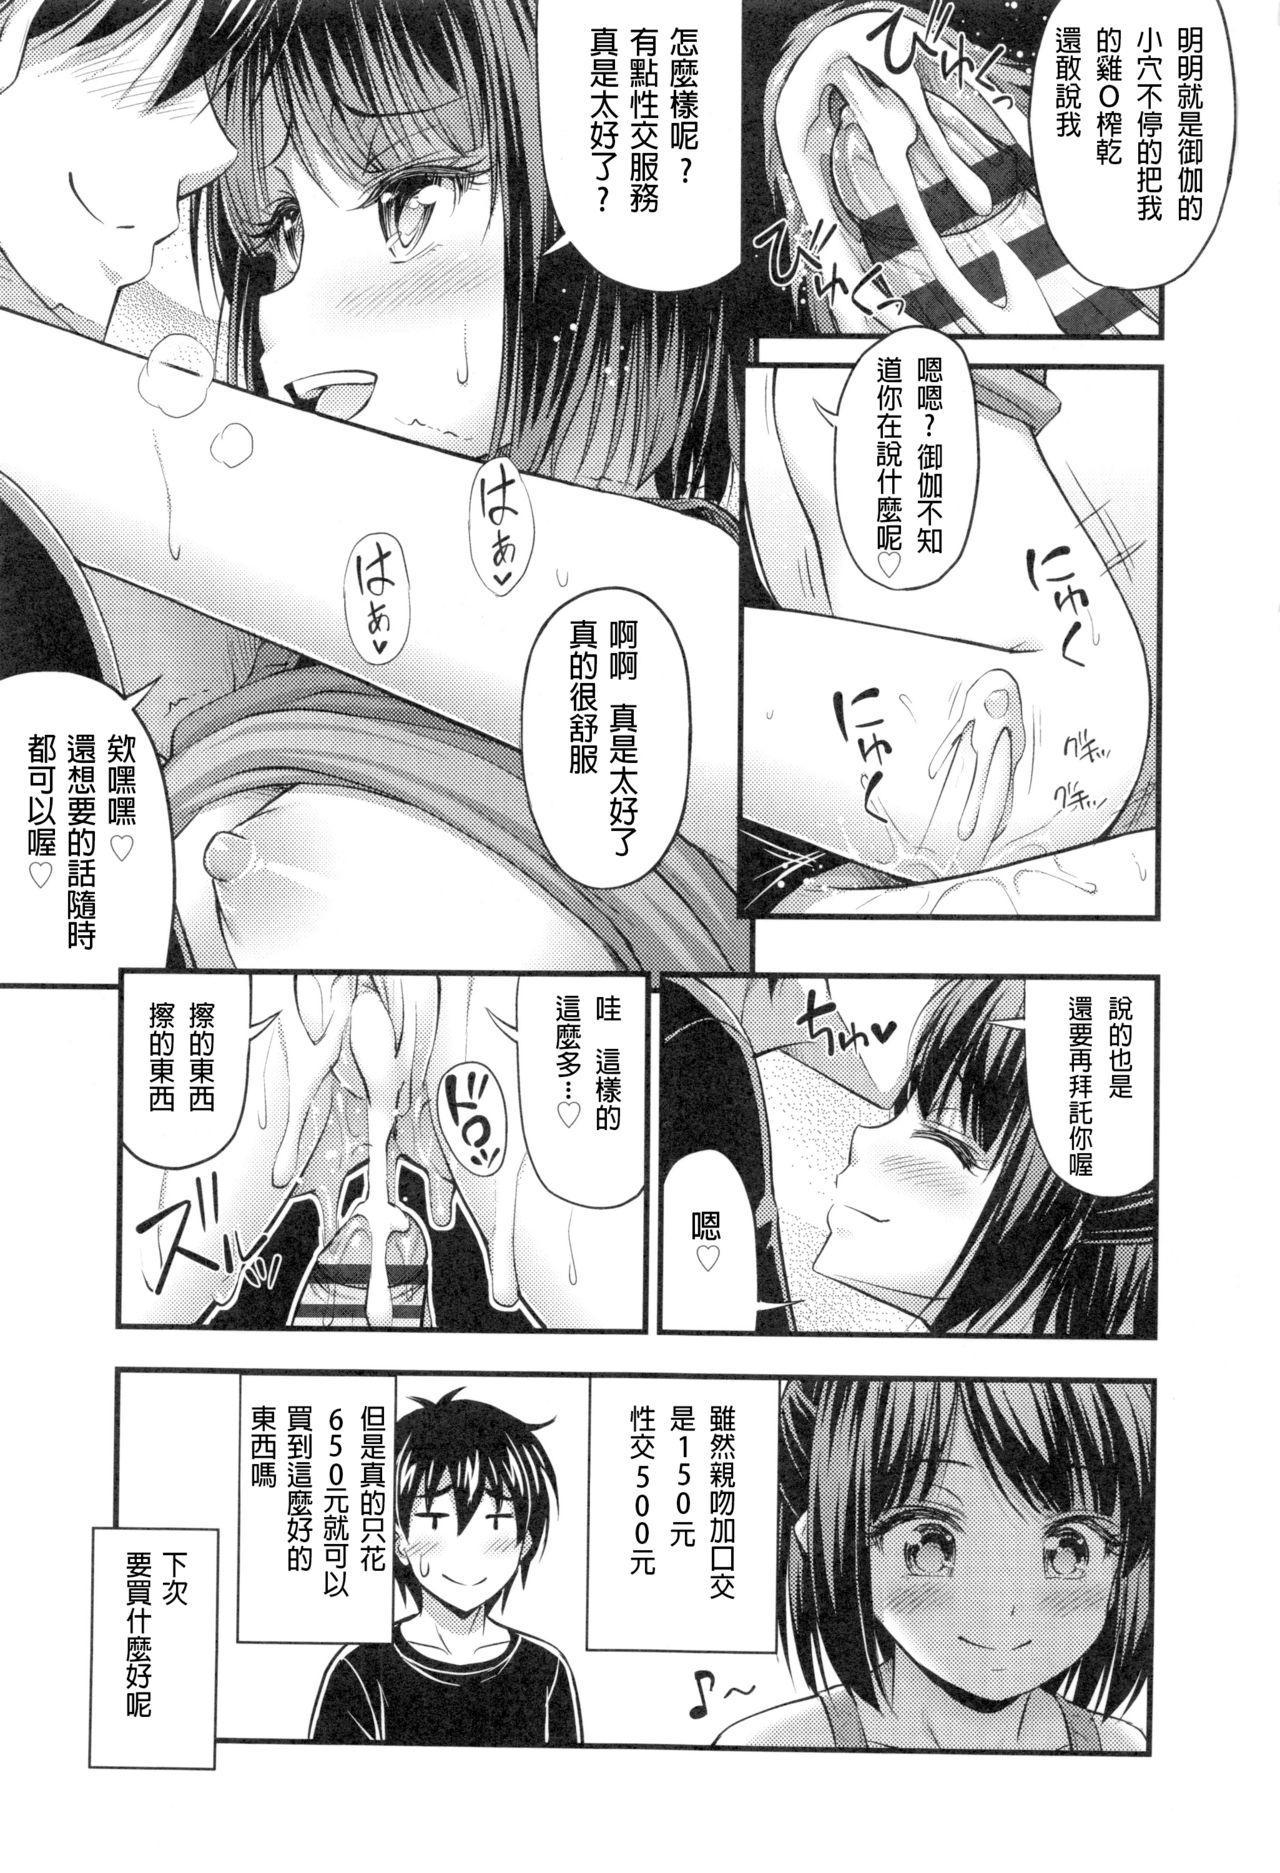 Onii-chan Sonna ni Short Pants Suki nano? 24